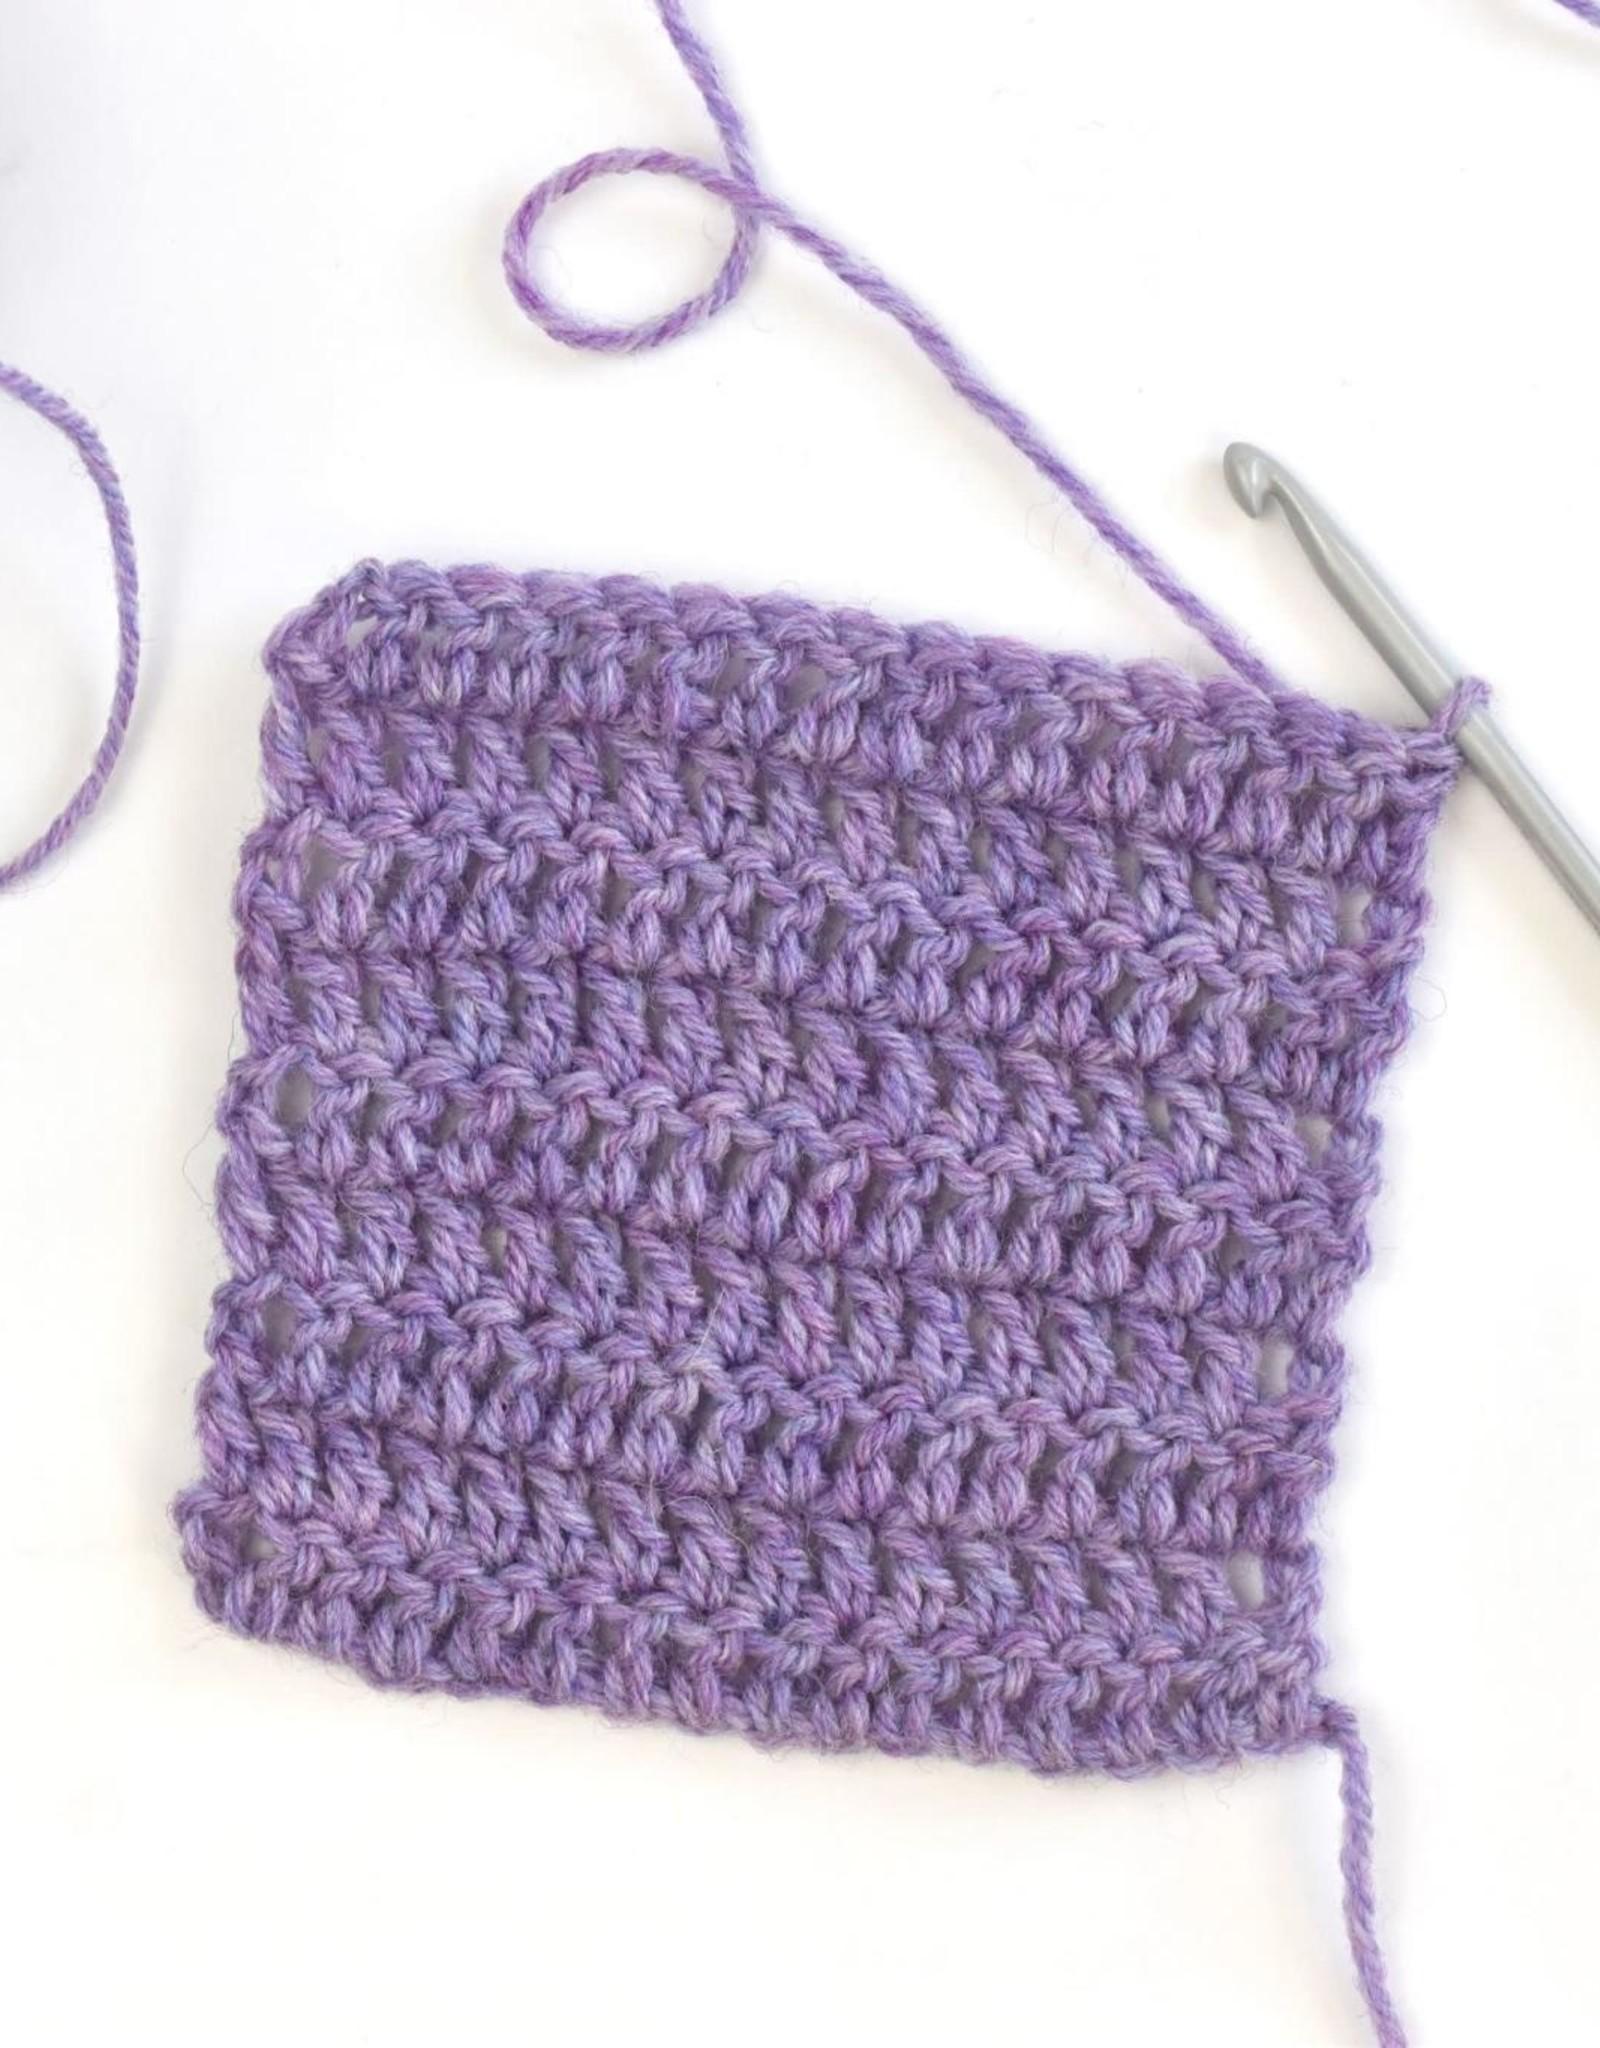 Crochet Refresher - Saturday, October 16th, 12-2pm